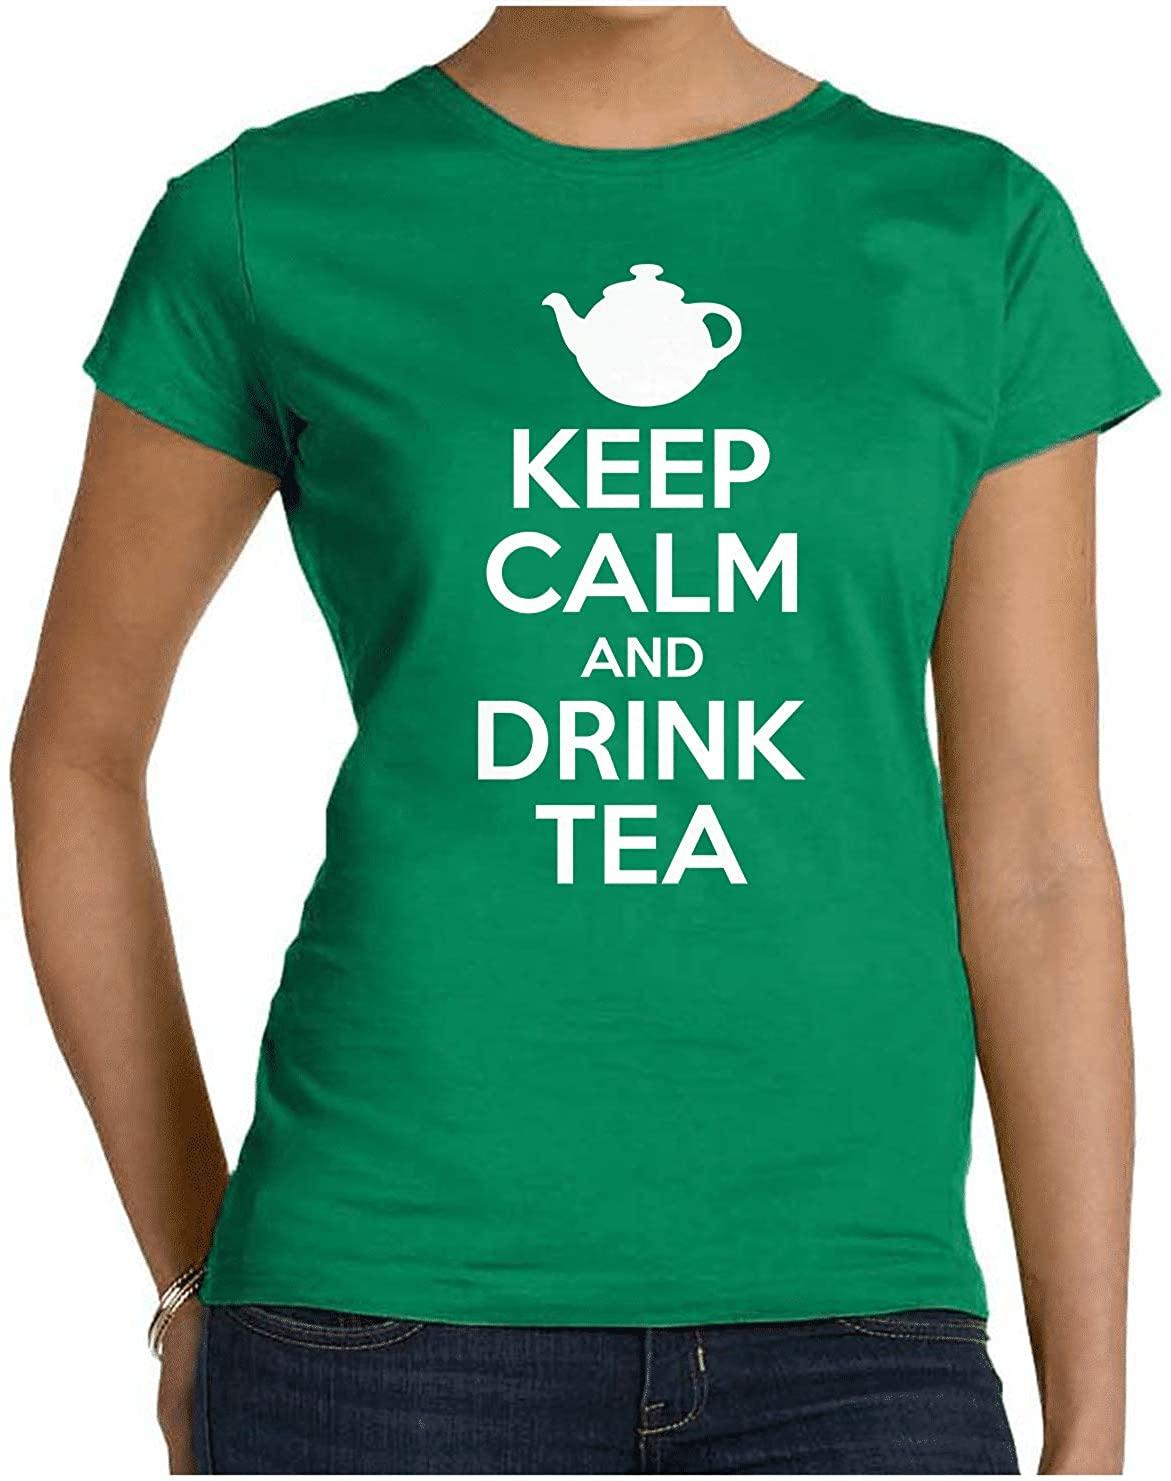 HARD EDGE DESIGN Women's Keep Calm and Drink Tea Crew Neck T-Shirt, Medium, Kelly Green